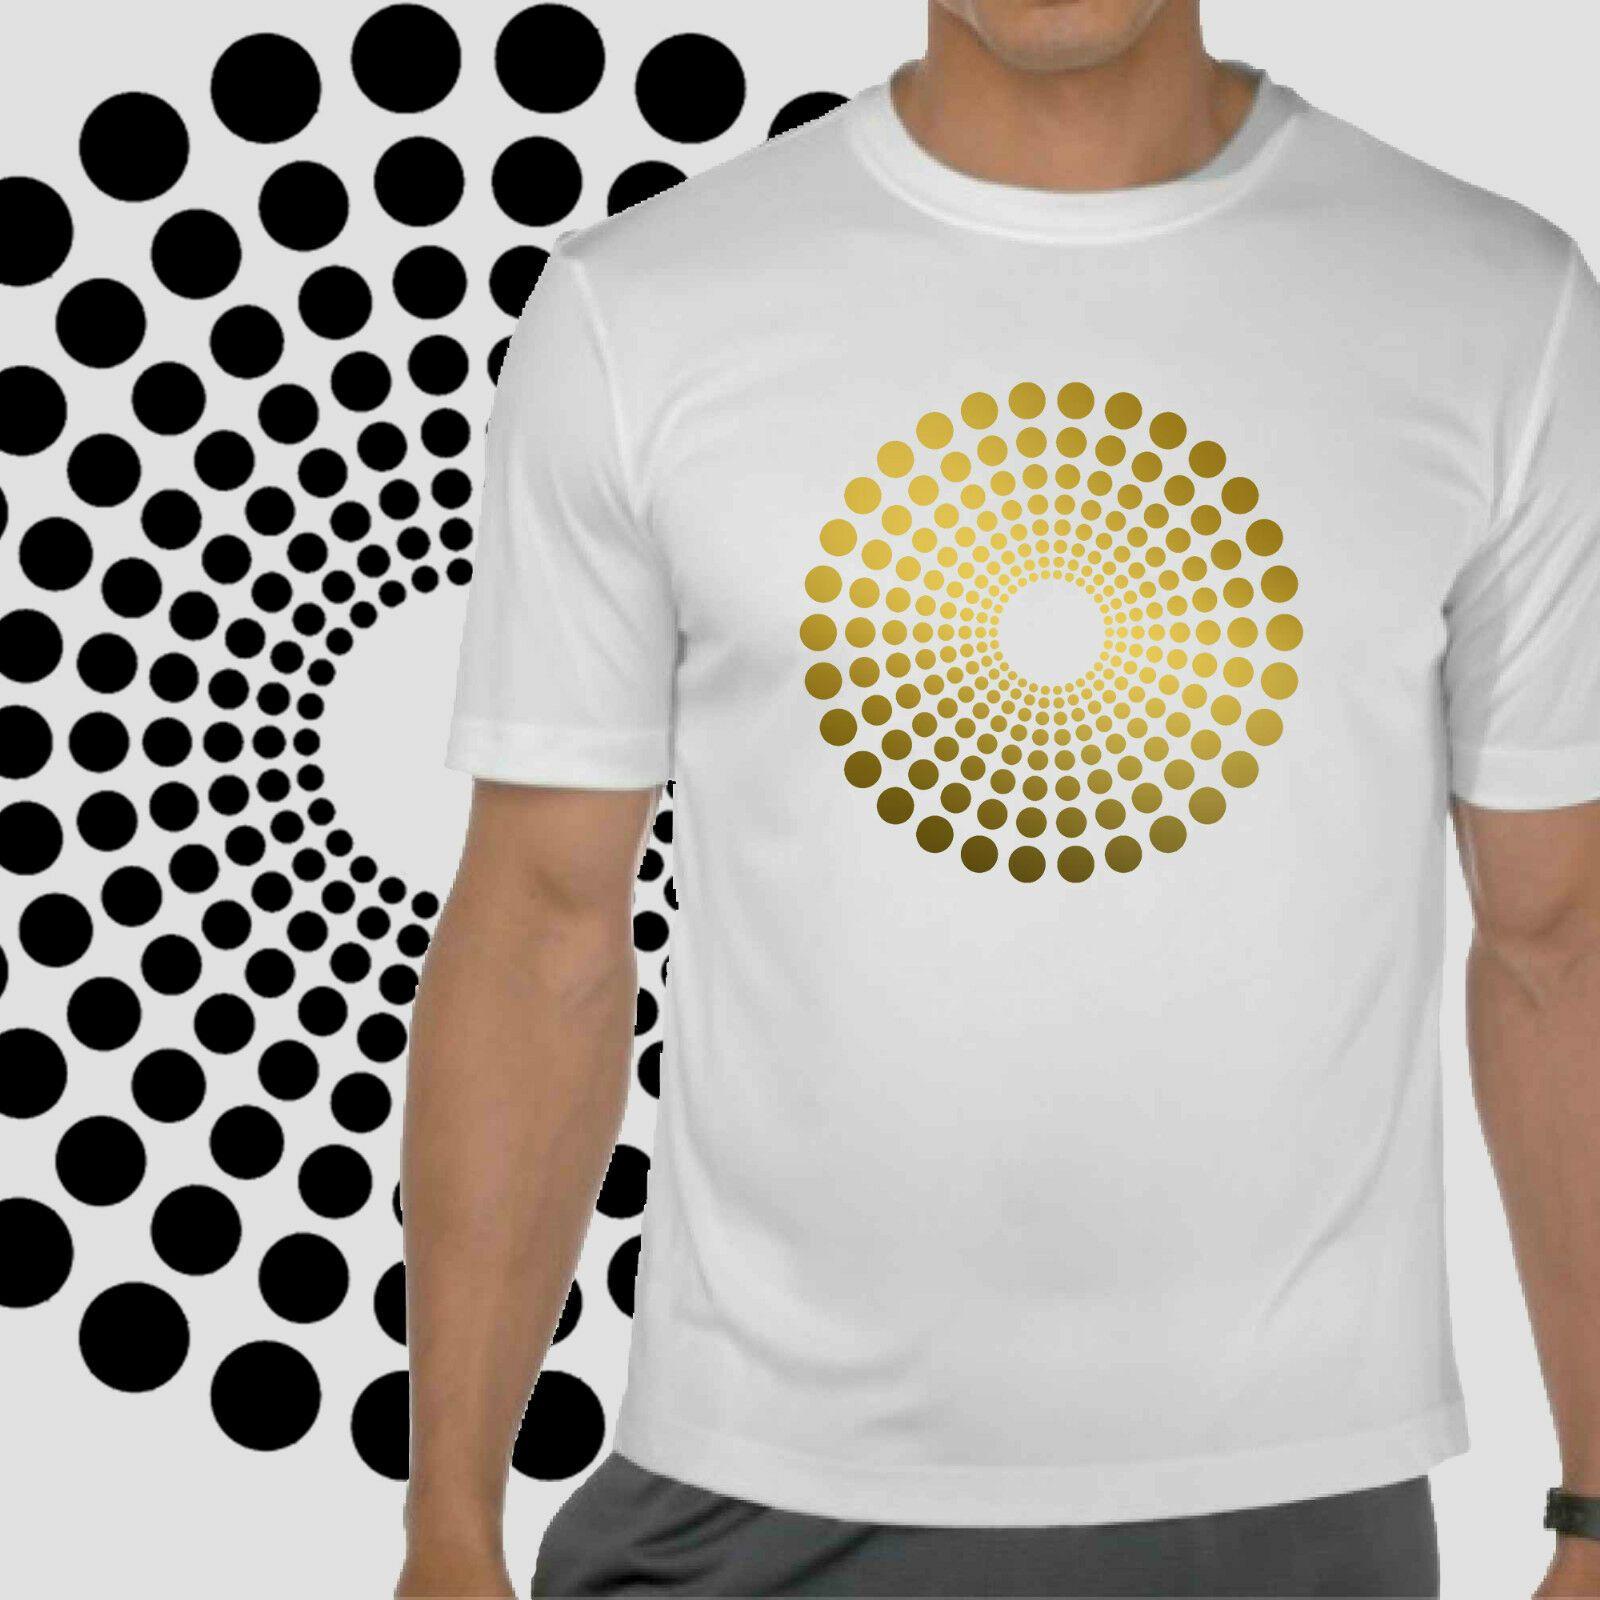 d0ebcb0da Mandala T shirt sacred geometry retor Tee geometric dot T beach festival T  shirt Men Women Unisex Fashion tshirt Free Shipping black